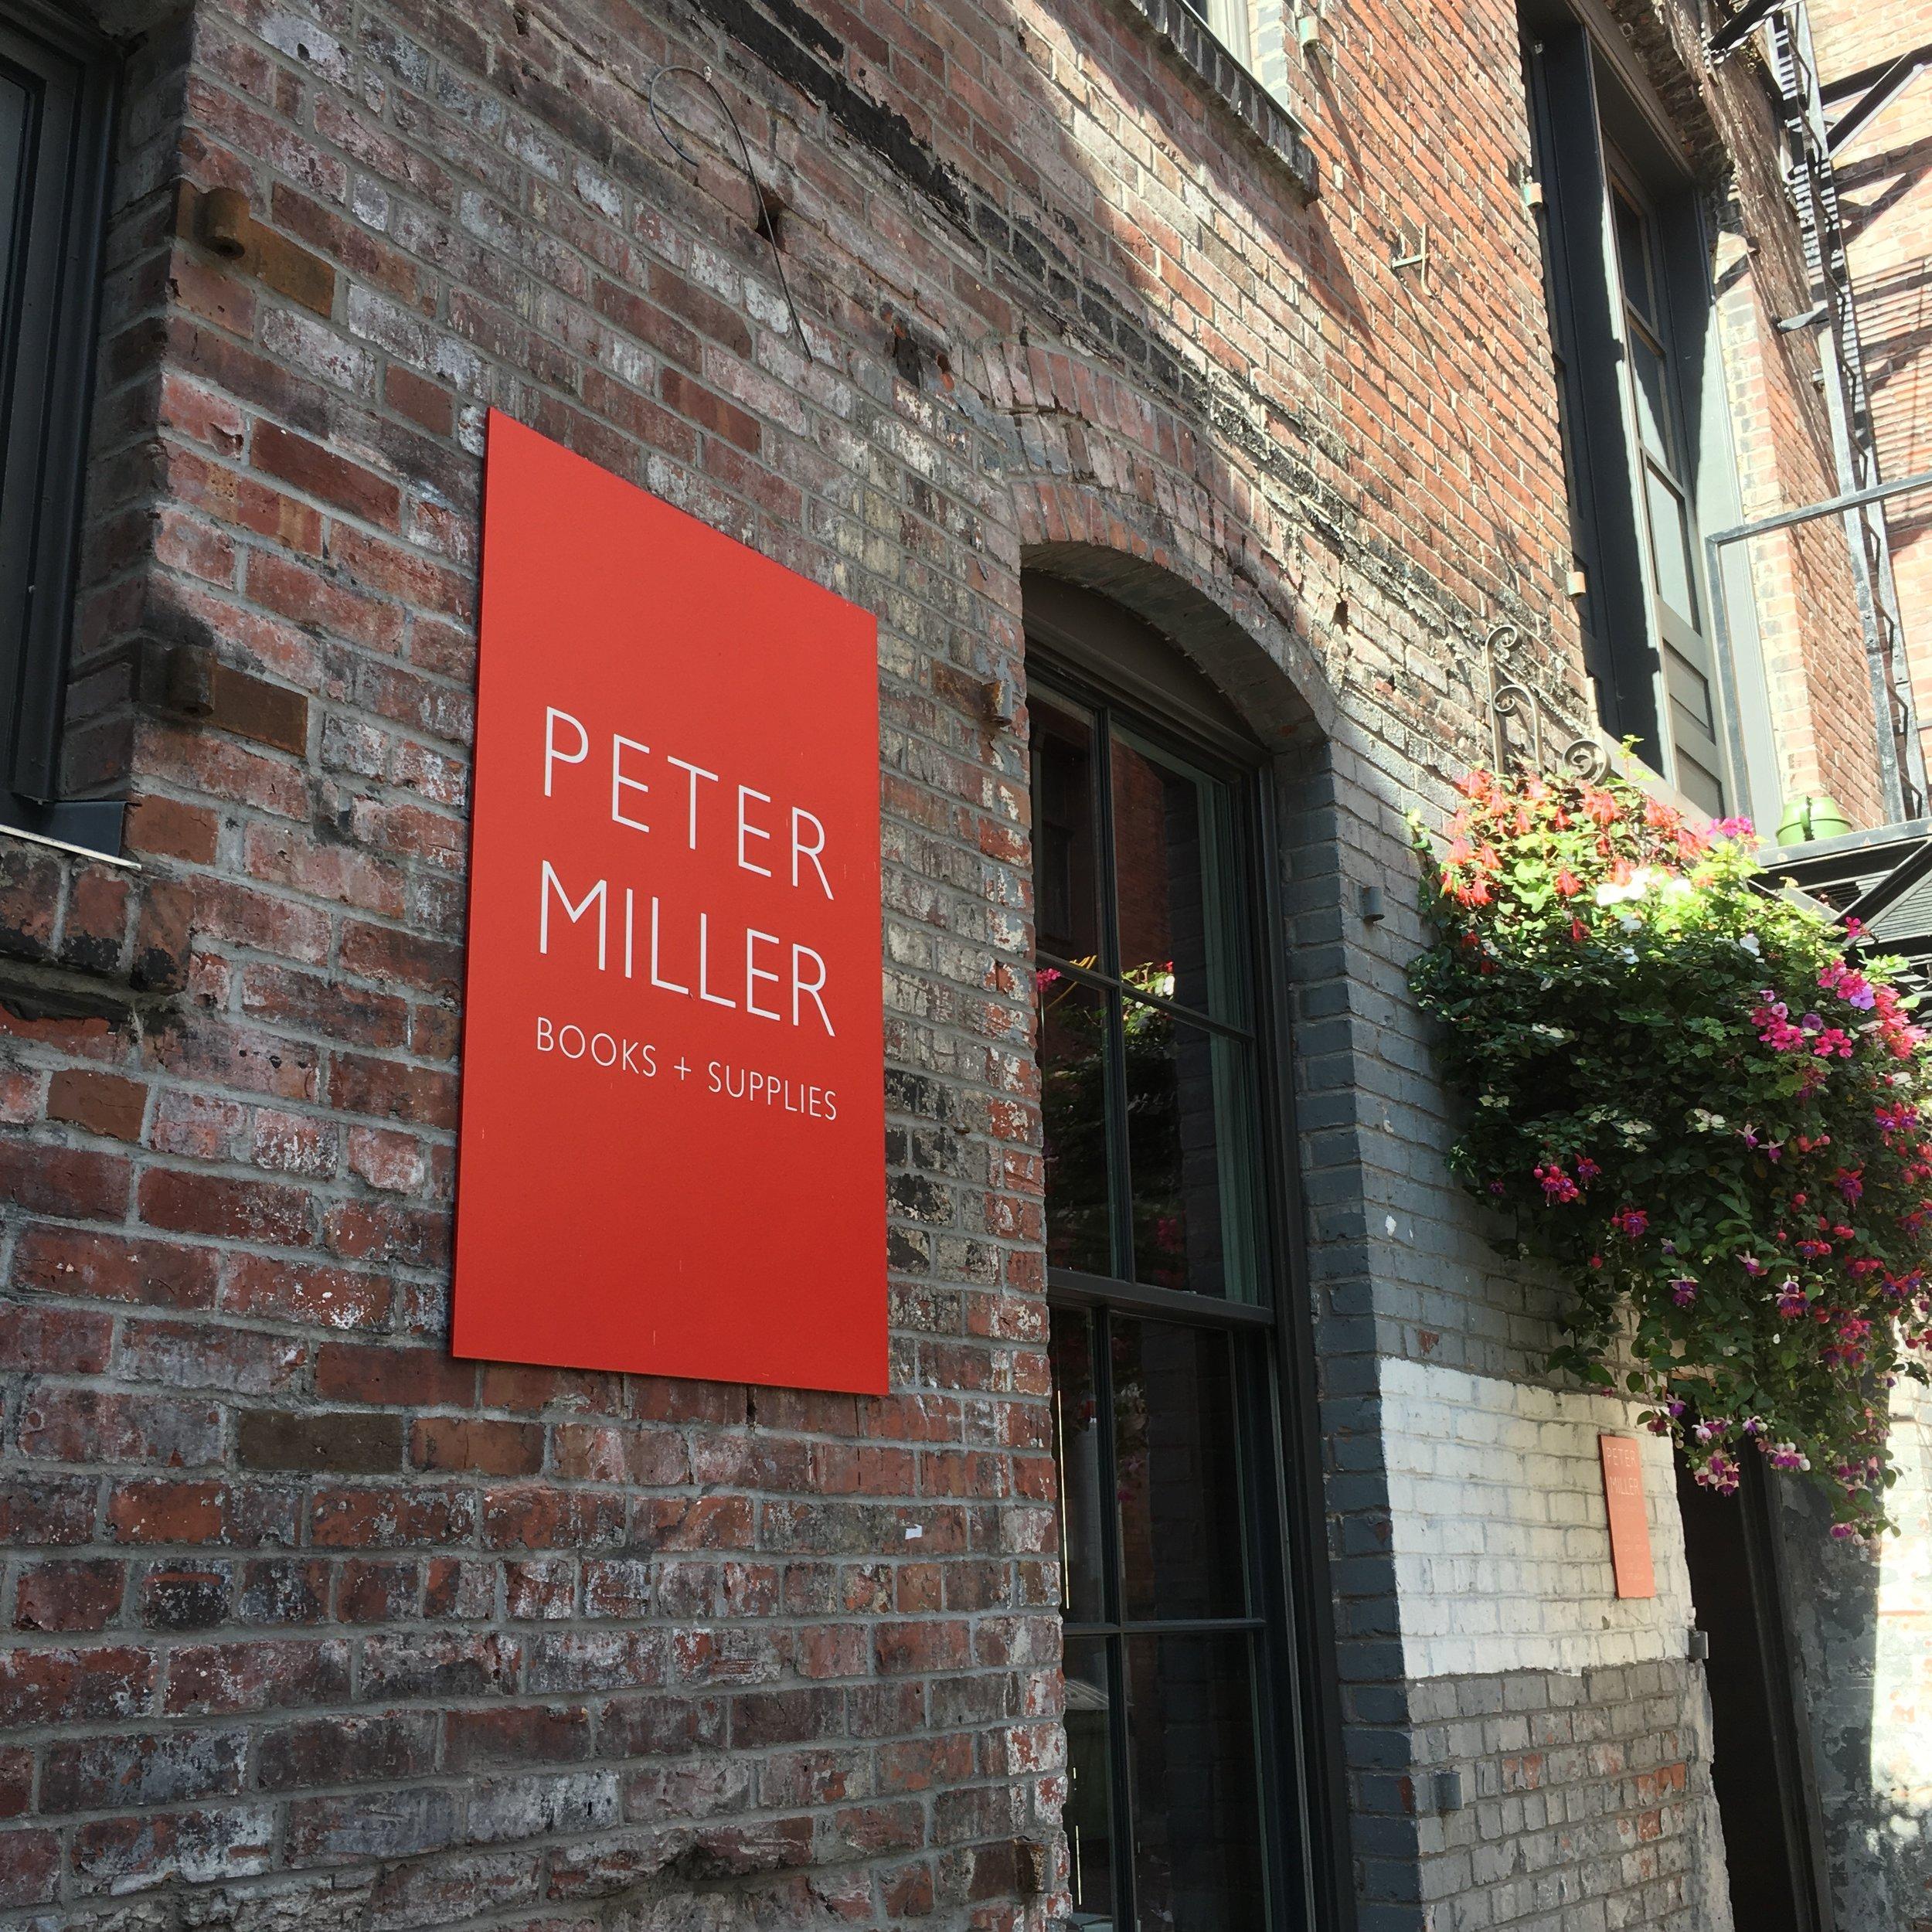 PeterMiller_shop20181002.jpg